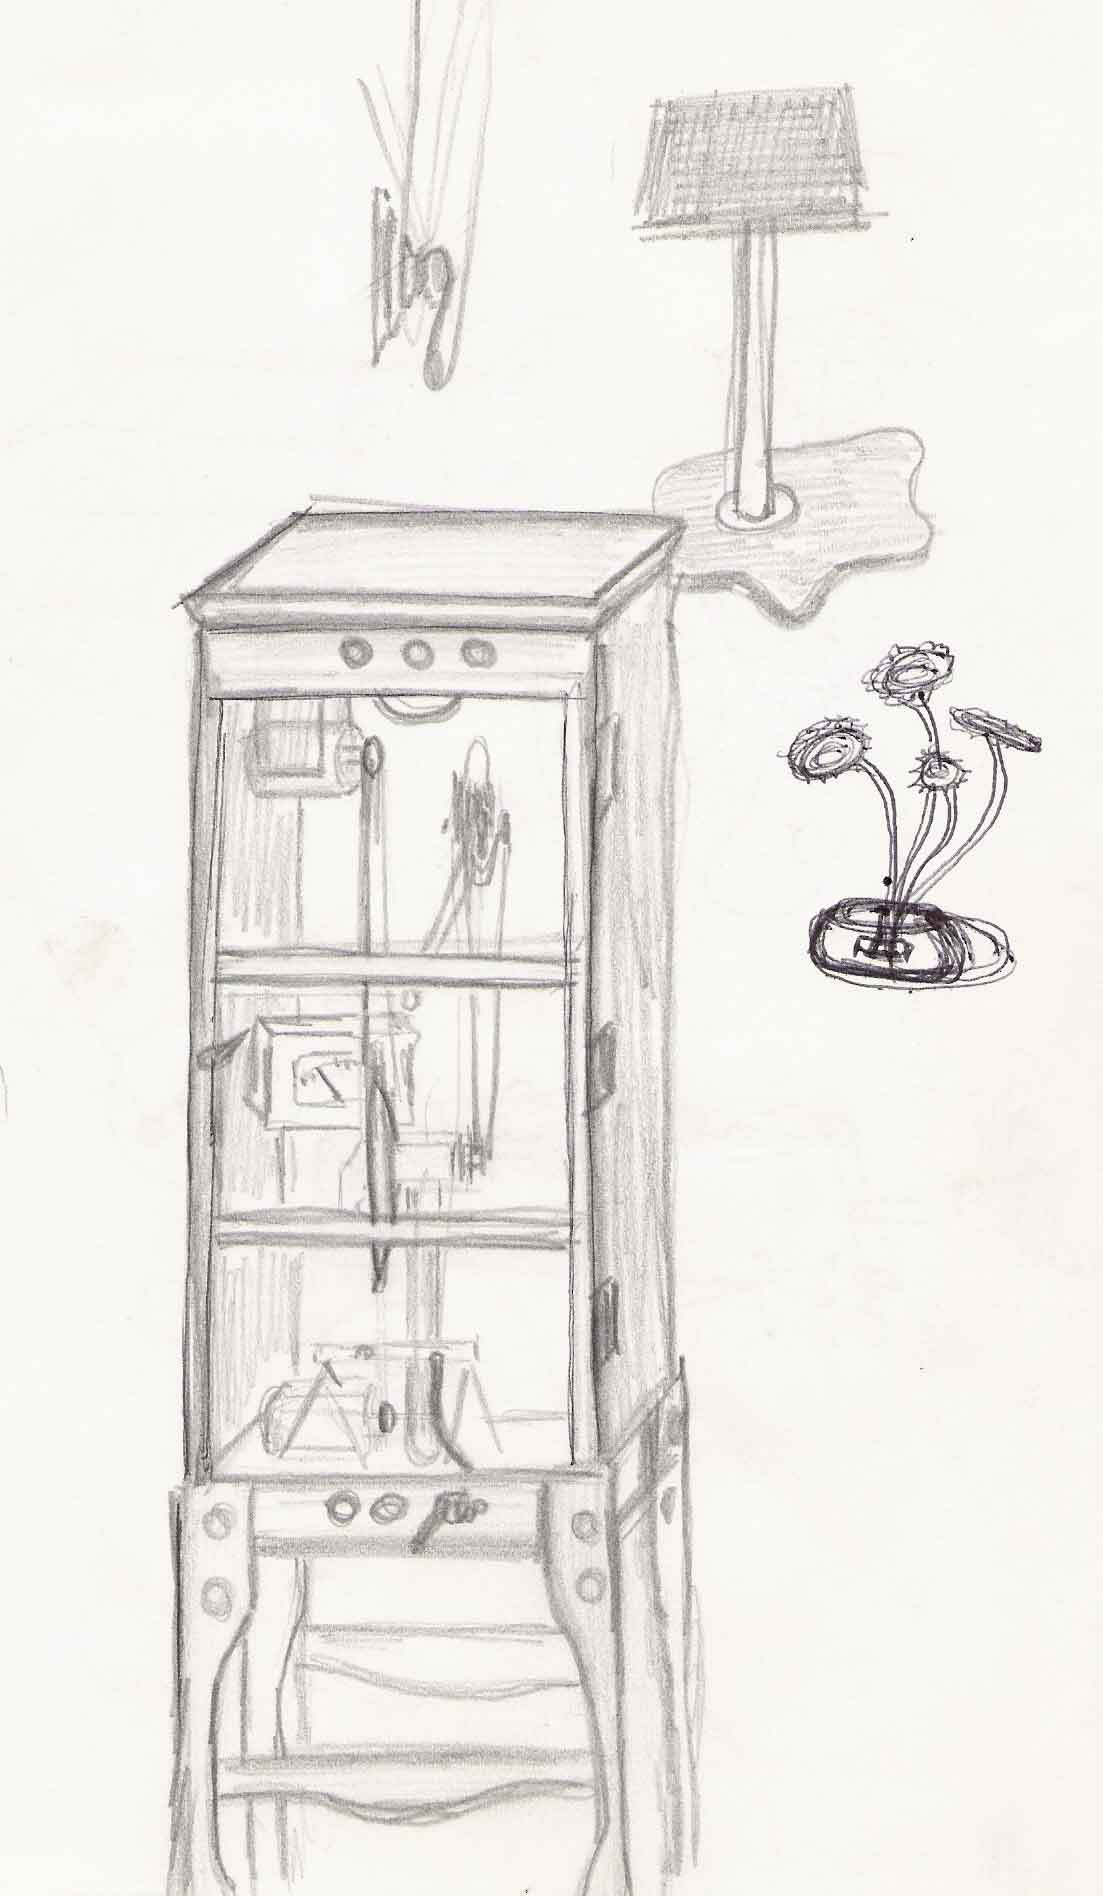 sketch-58-sept-05.jpg